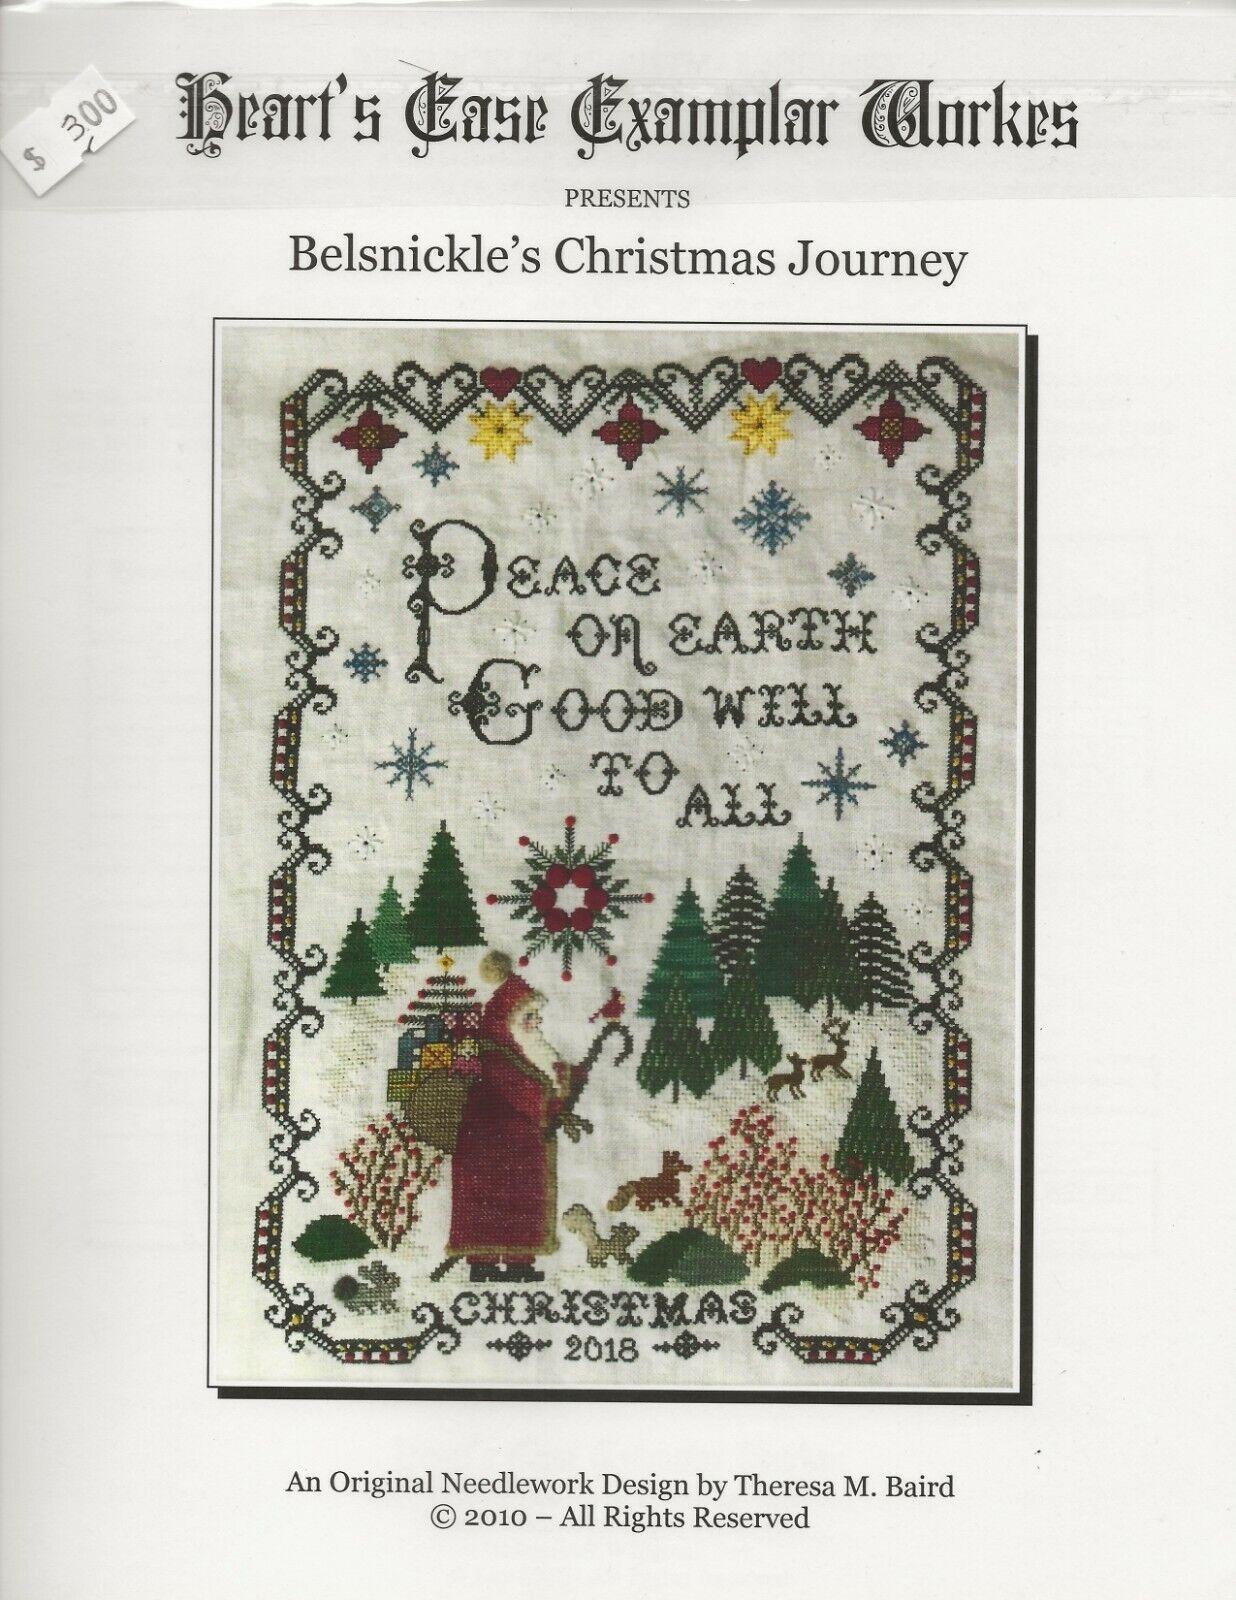 Belsnickle s Christmas Journey Cross Stitch Needlework Chart HeartsEaseExamplar - $20.00